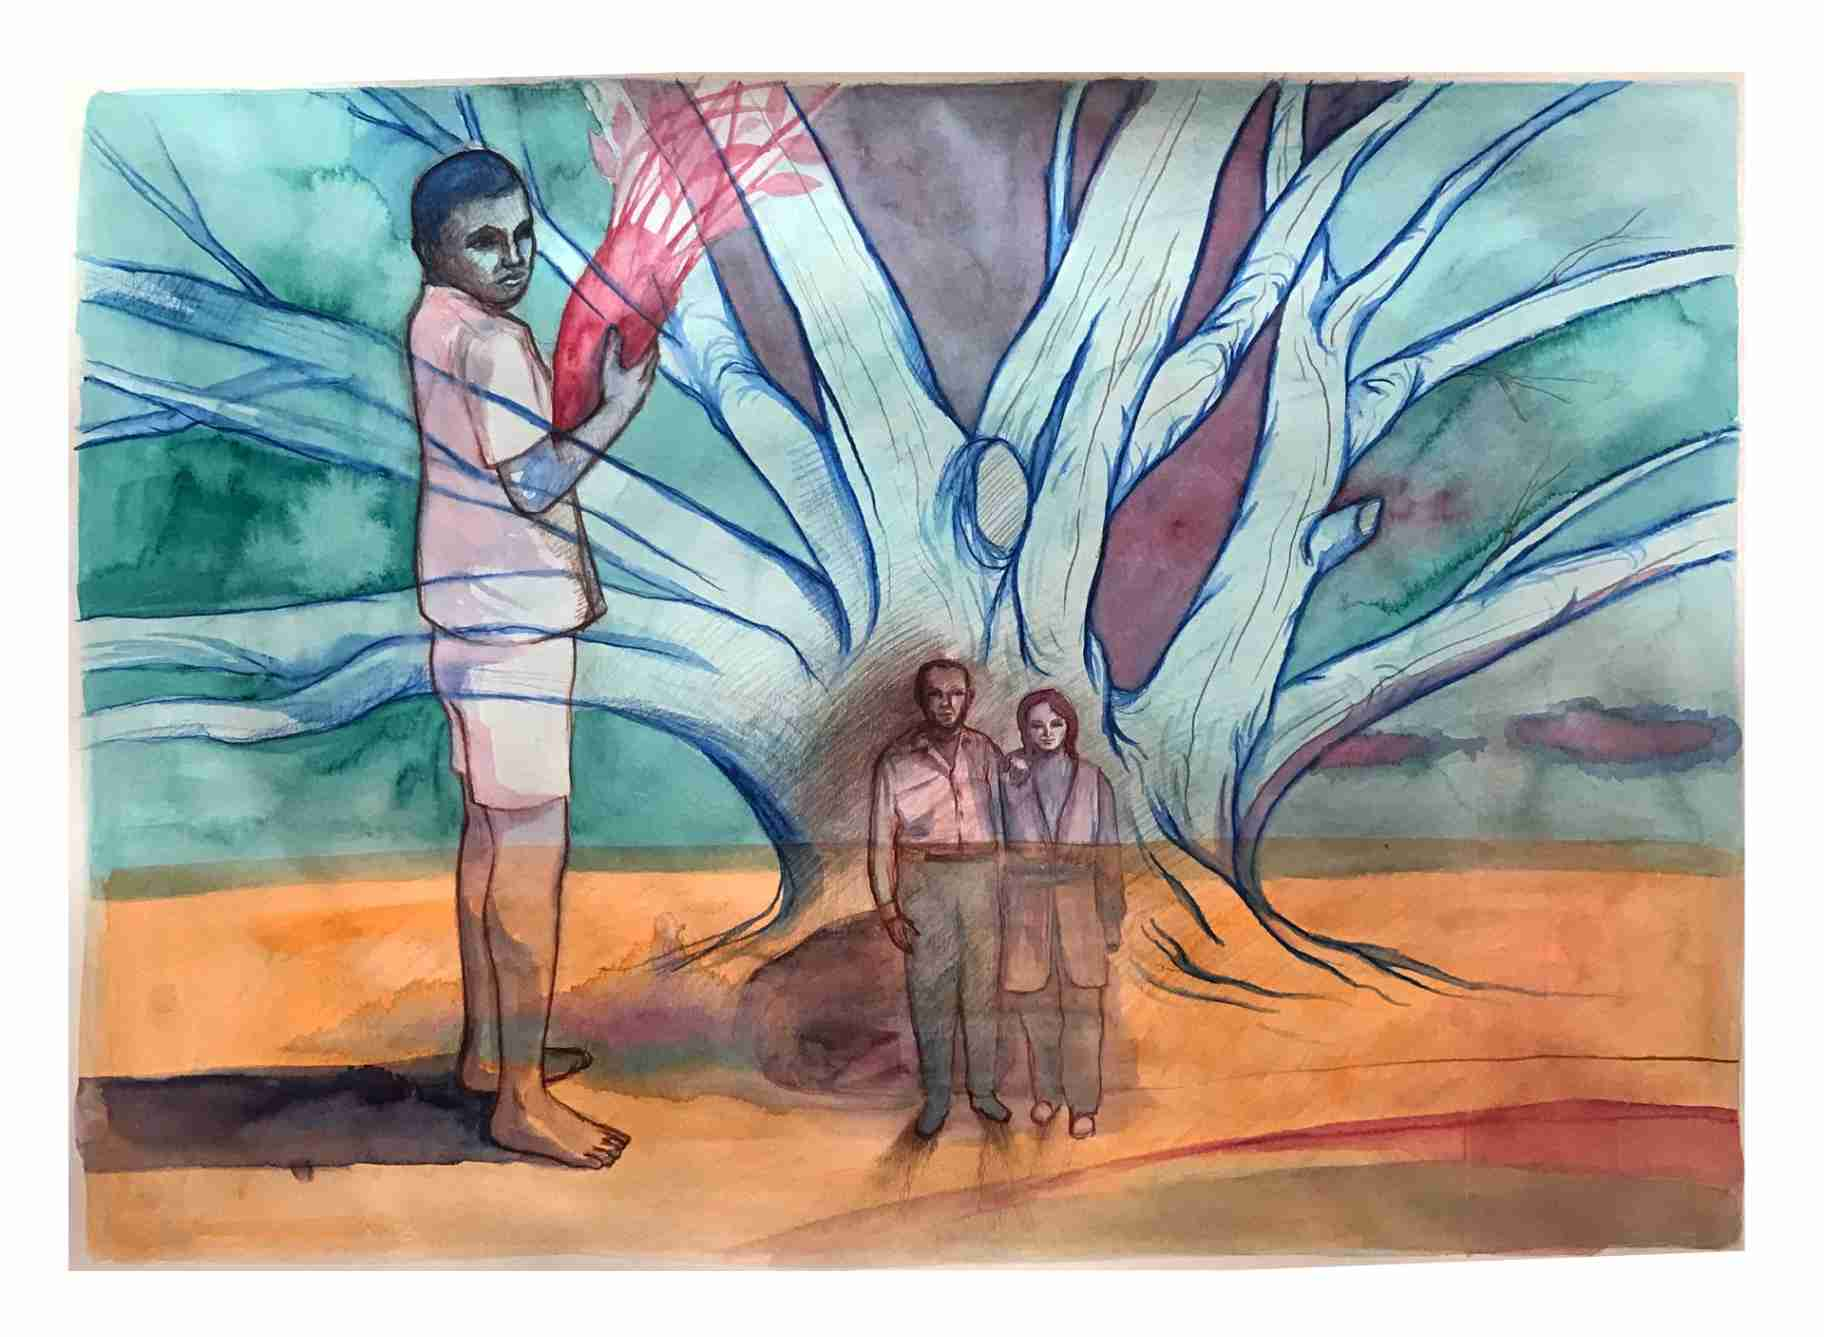 Obra: Homage to the land / Homenage a la tierra